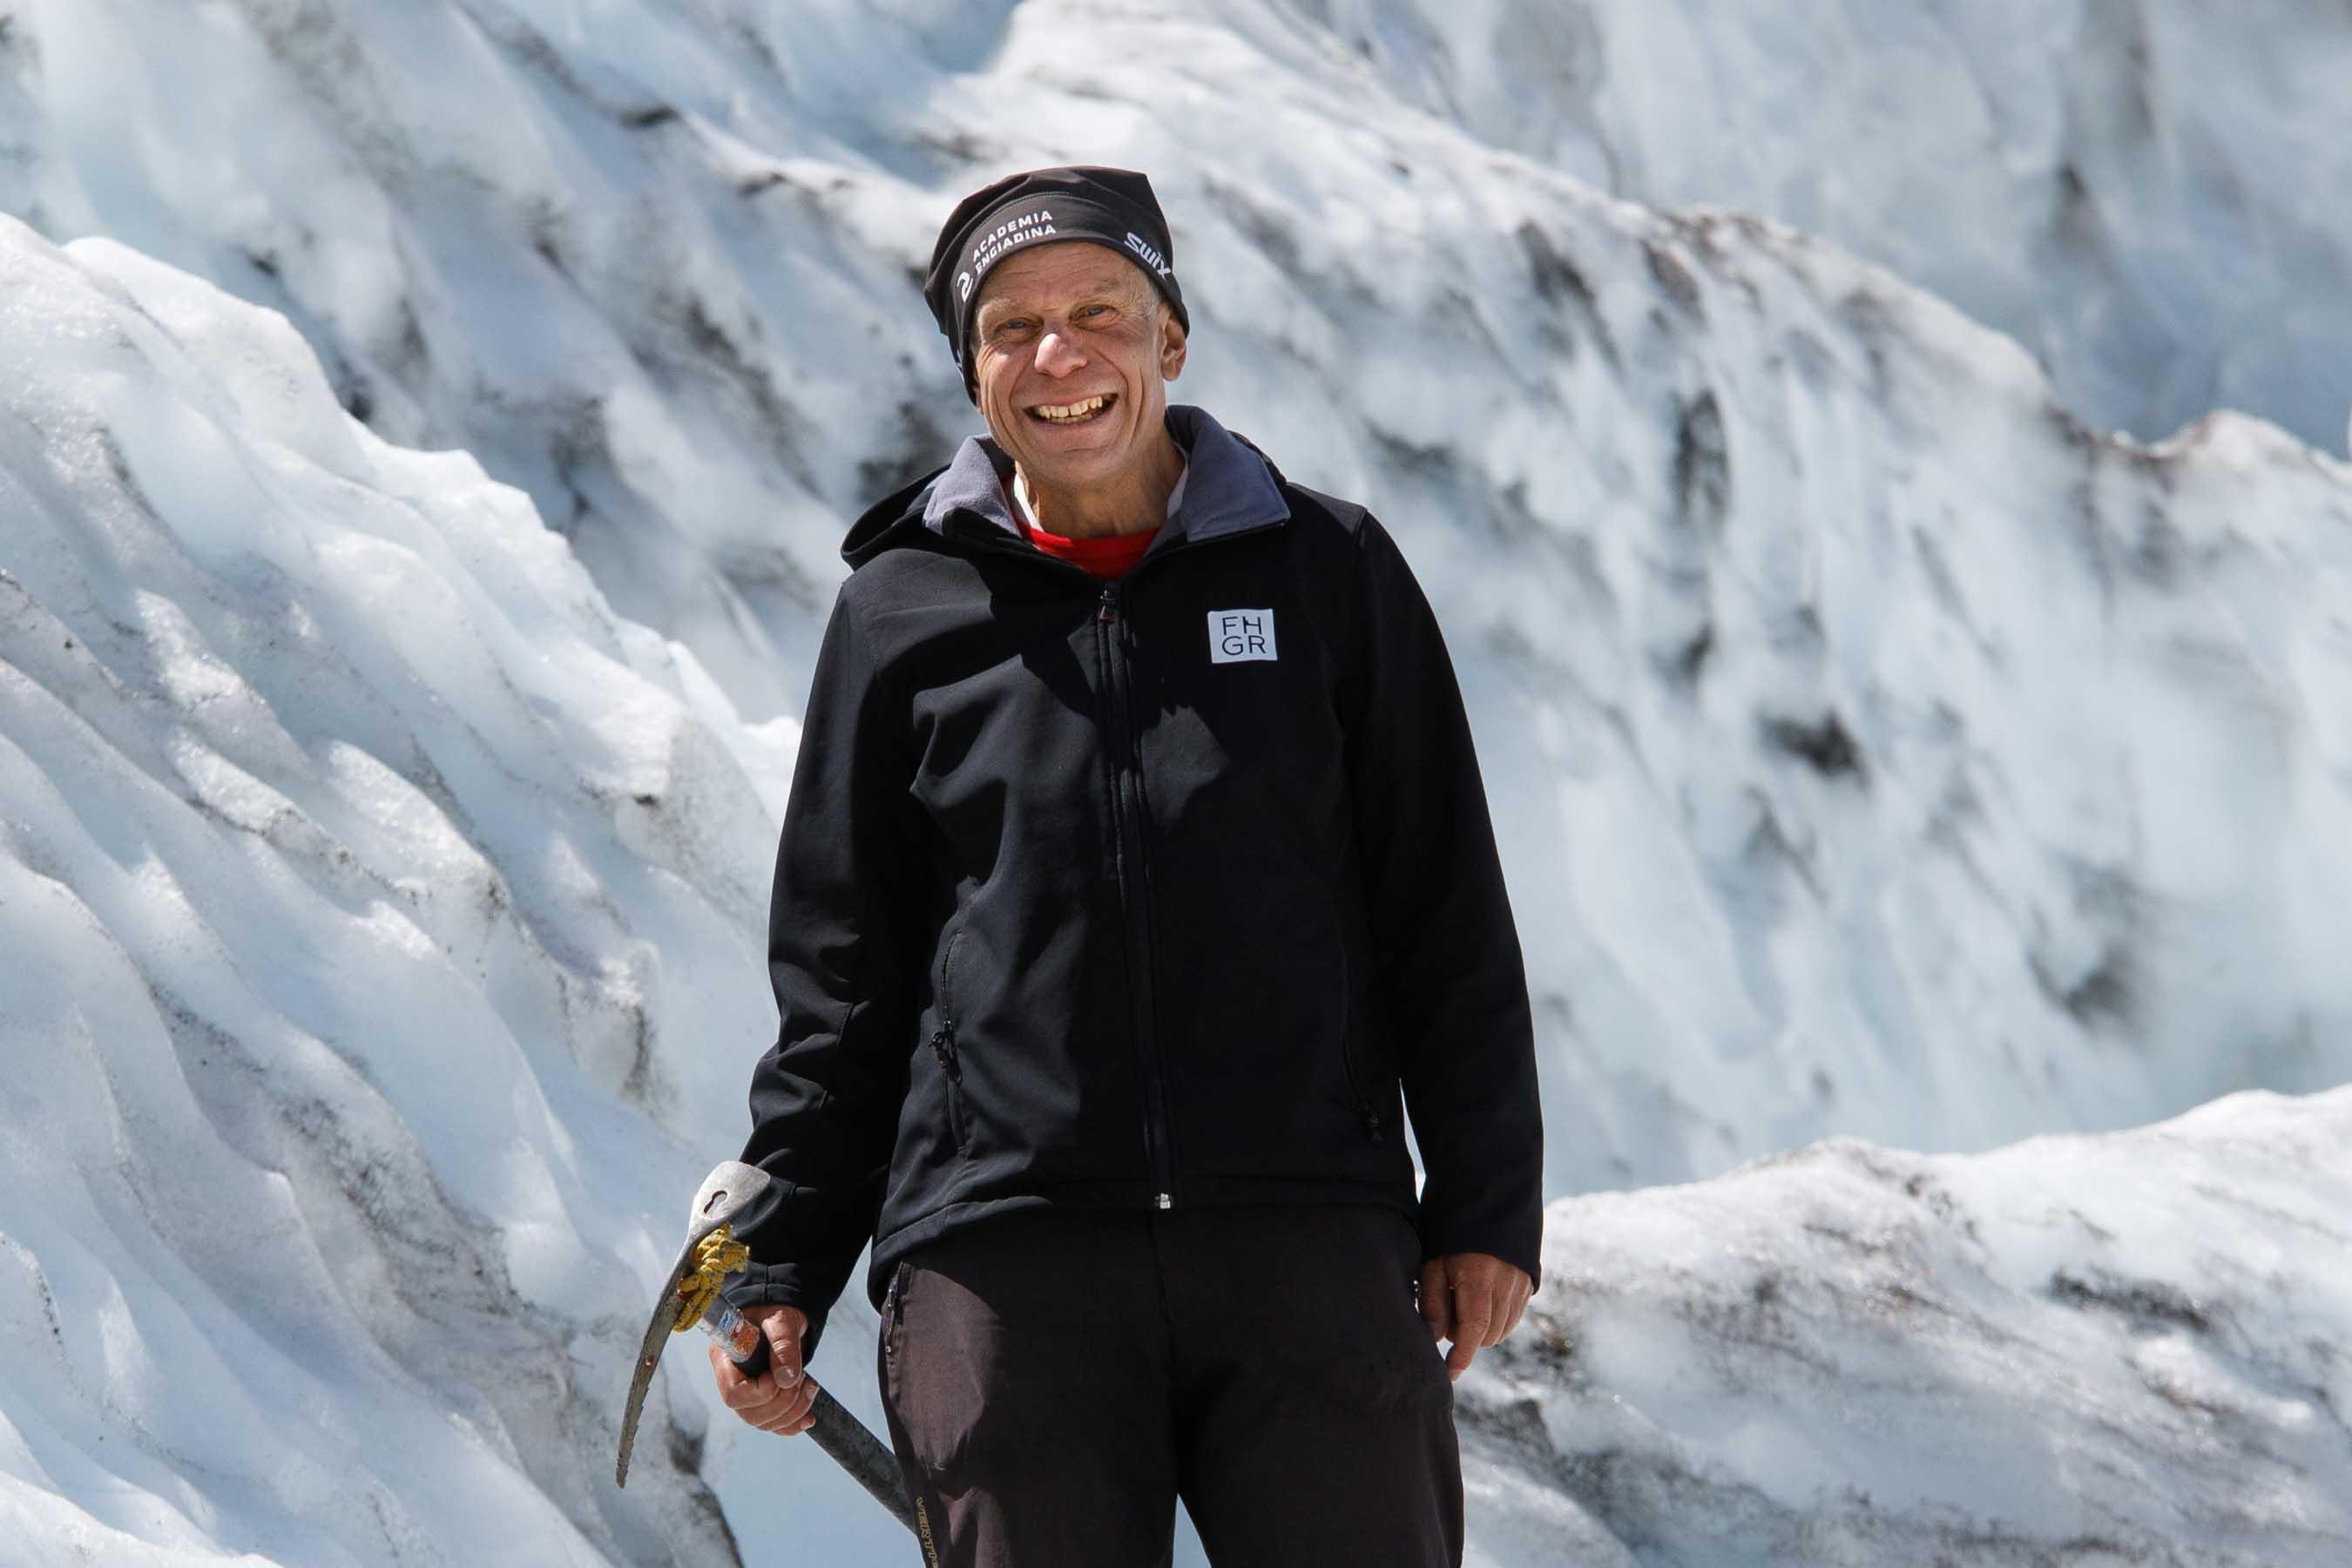 Glaciologist Felix Keller on the Morteratsch Glacier, Switzerland